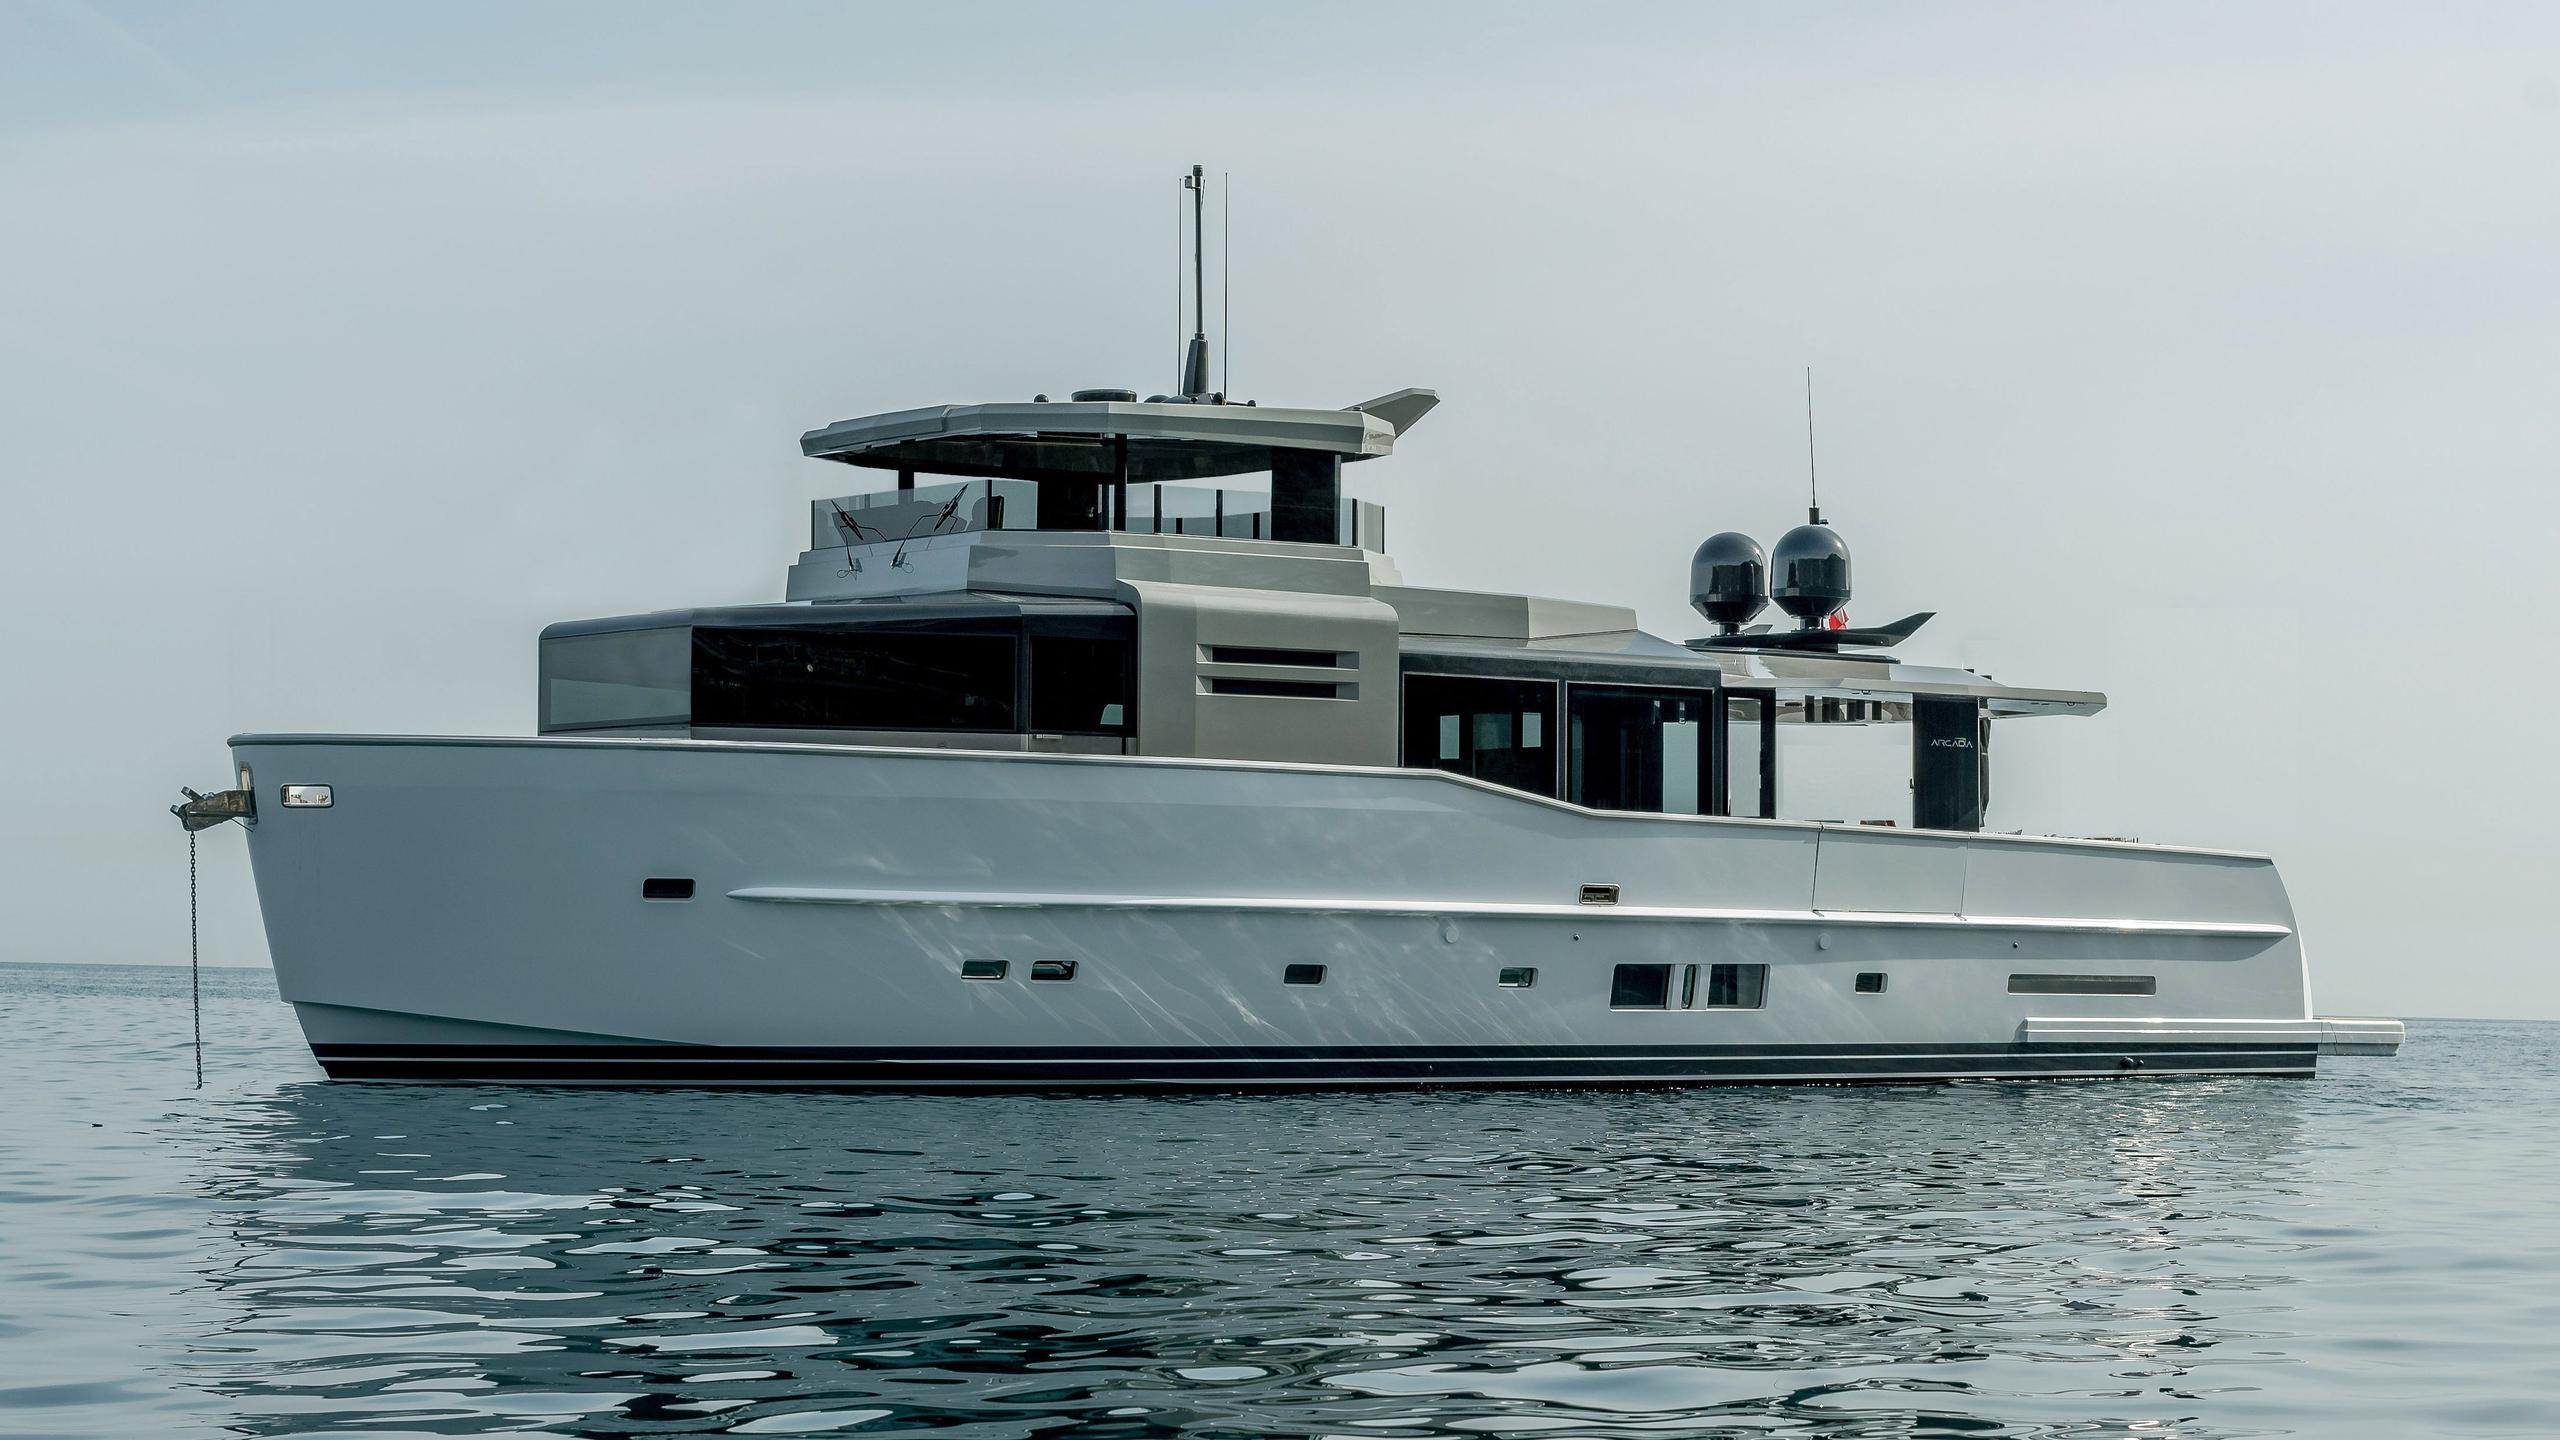 arcadia-85s-hull-1-motoryacht-arcadia-yachts-2016-26m-profile